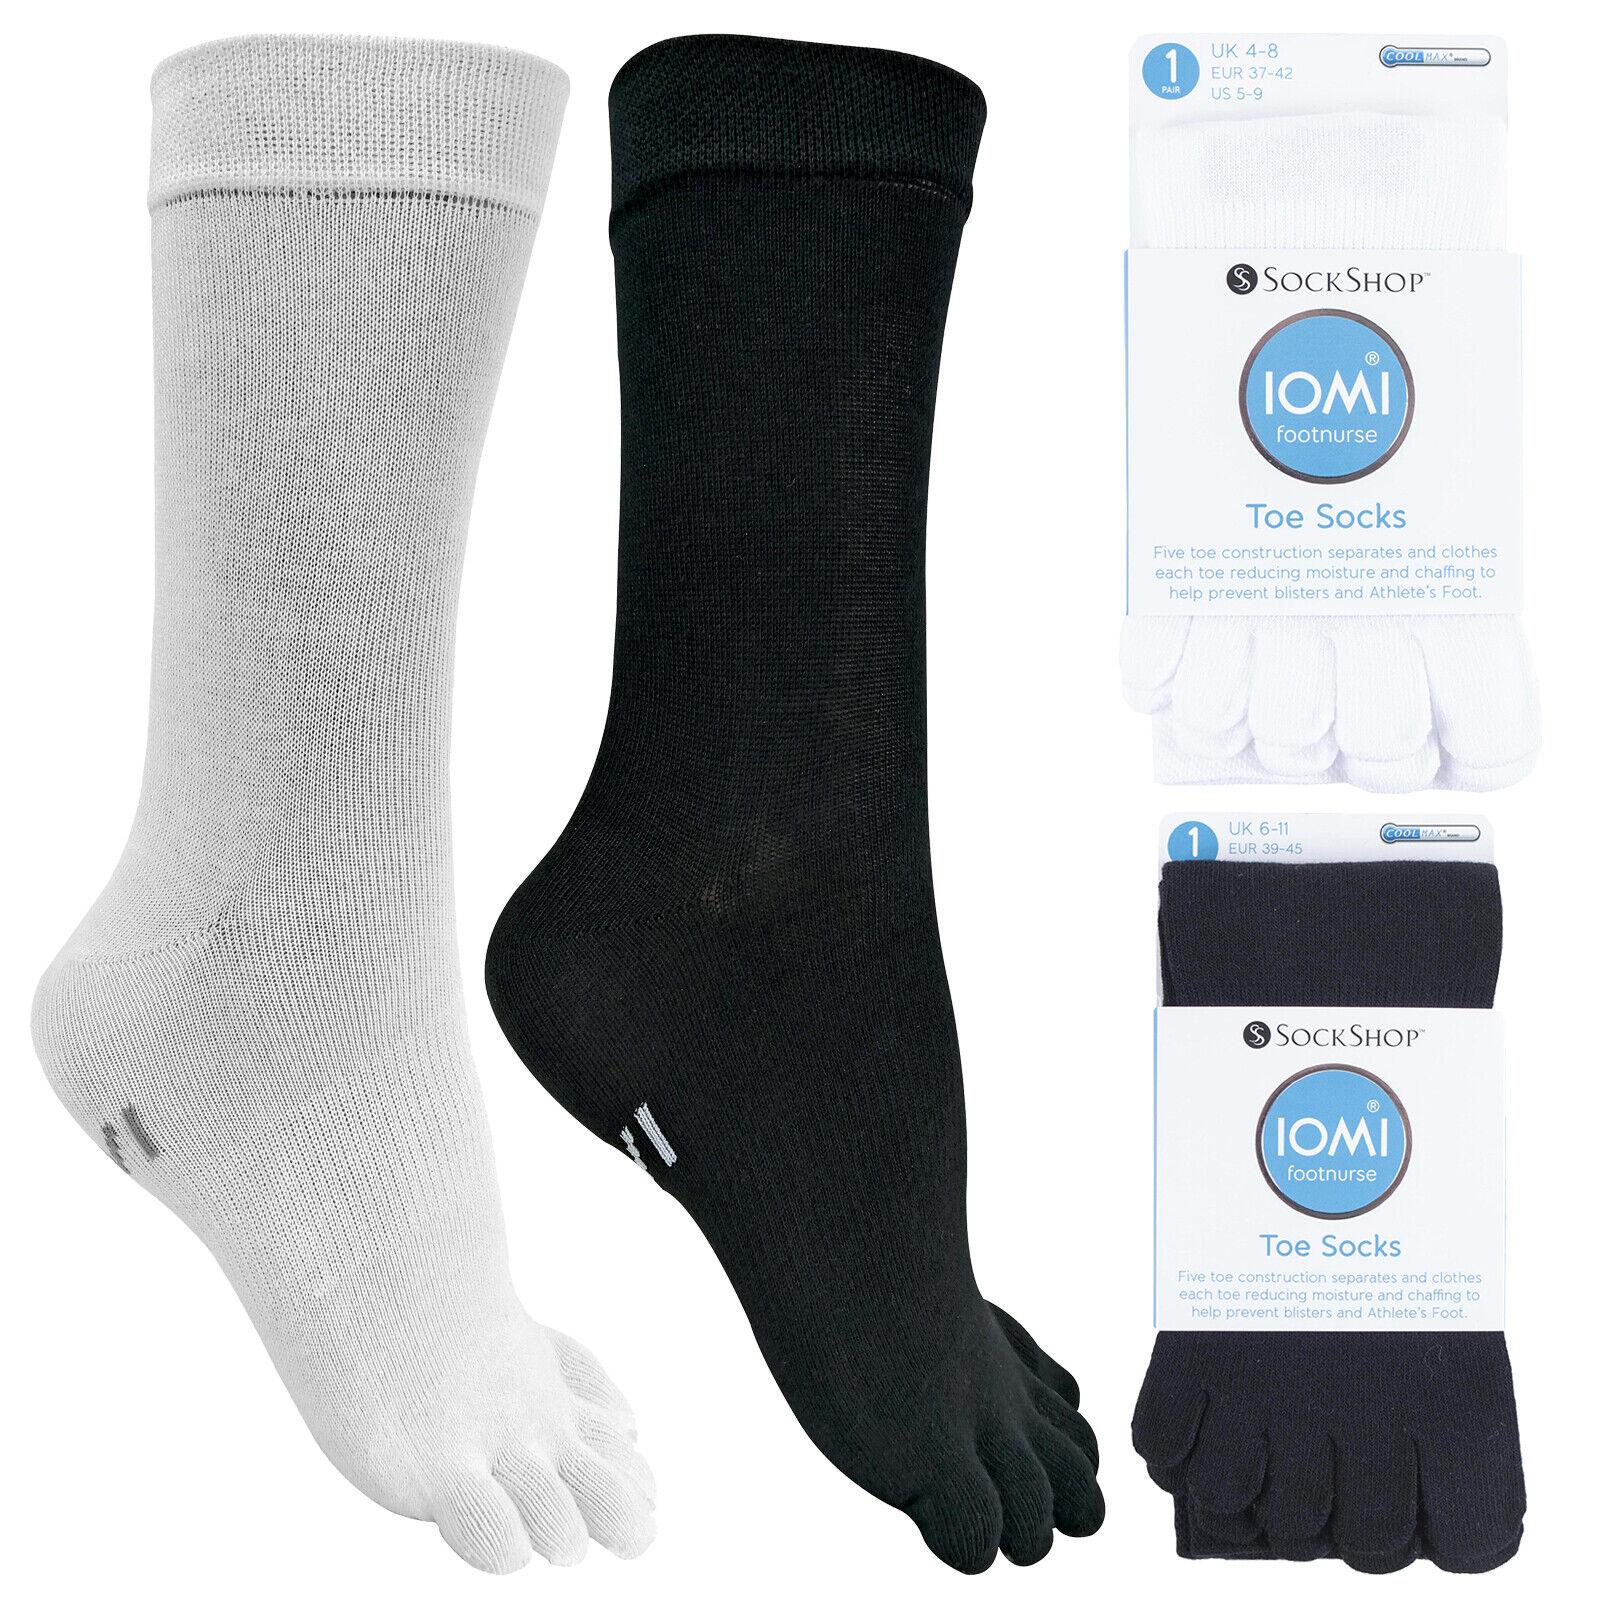 IOMI - Mens & Womens Lightweight Coolmax Cotton Toe Socks fo